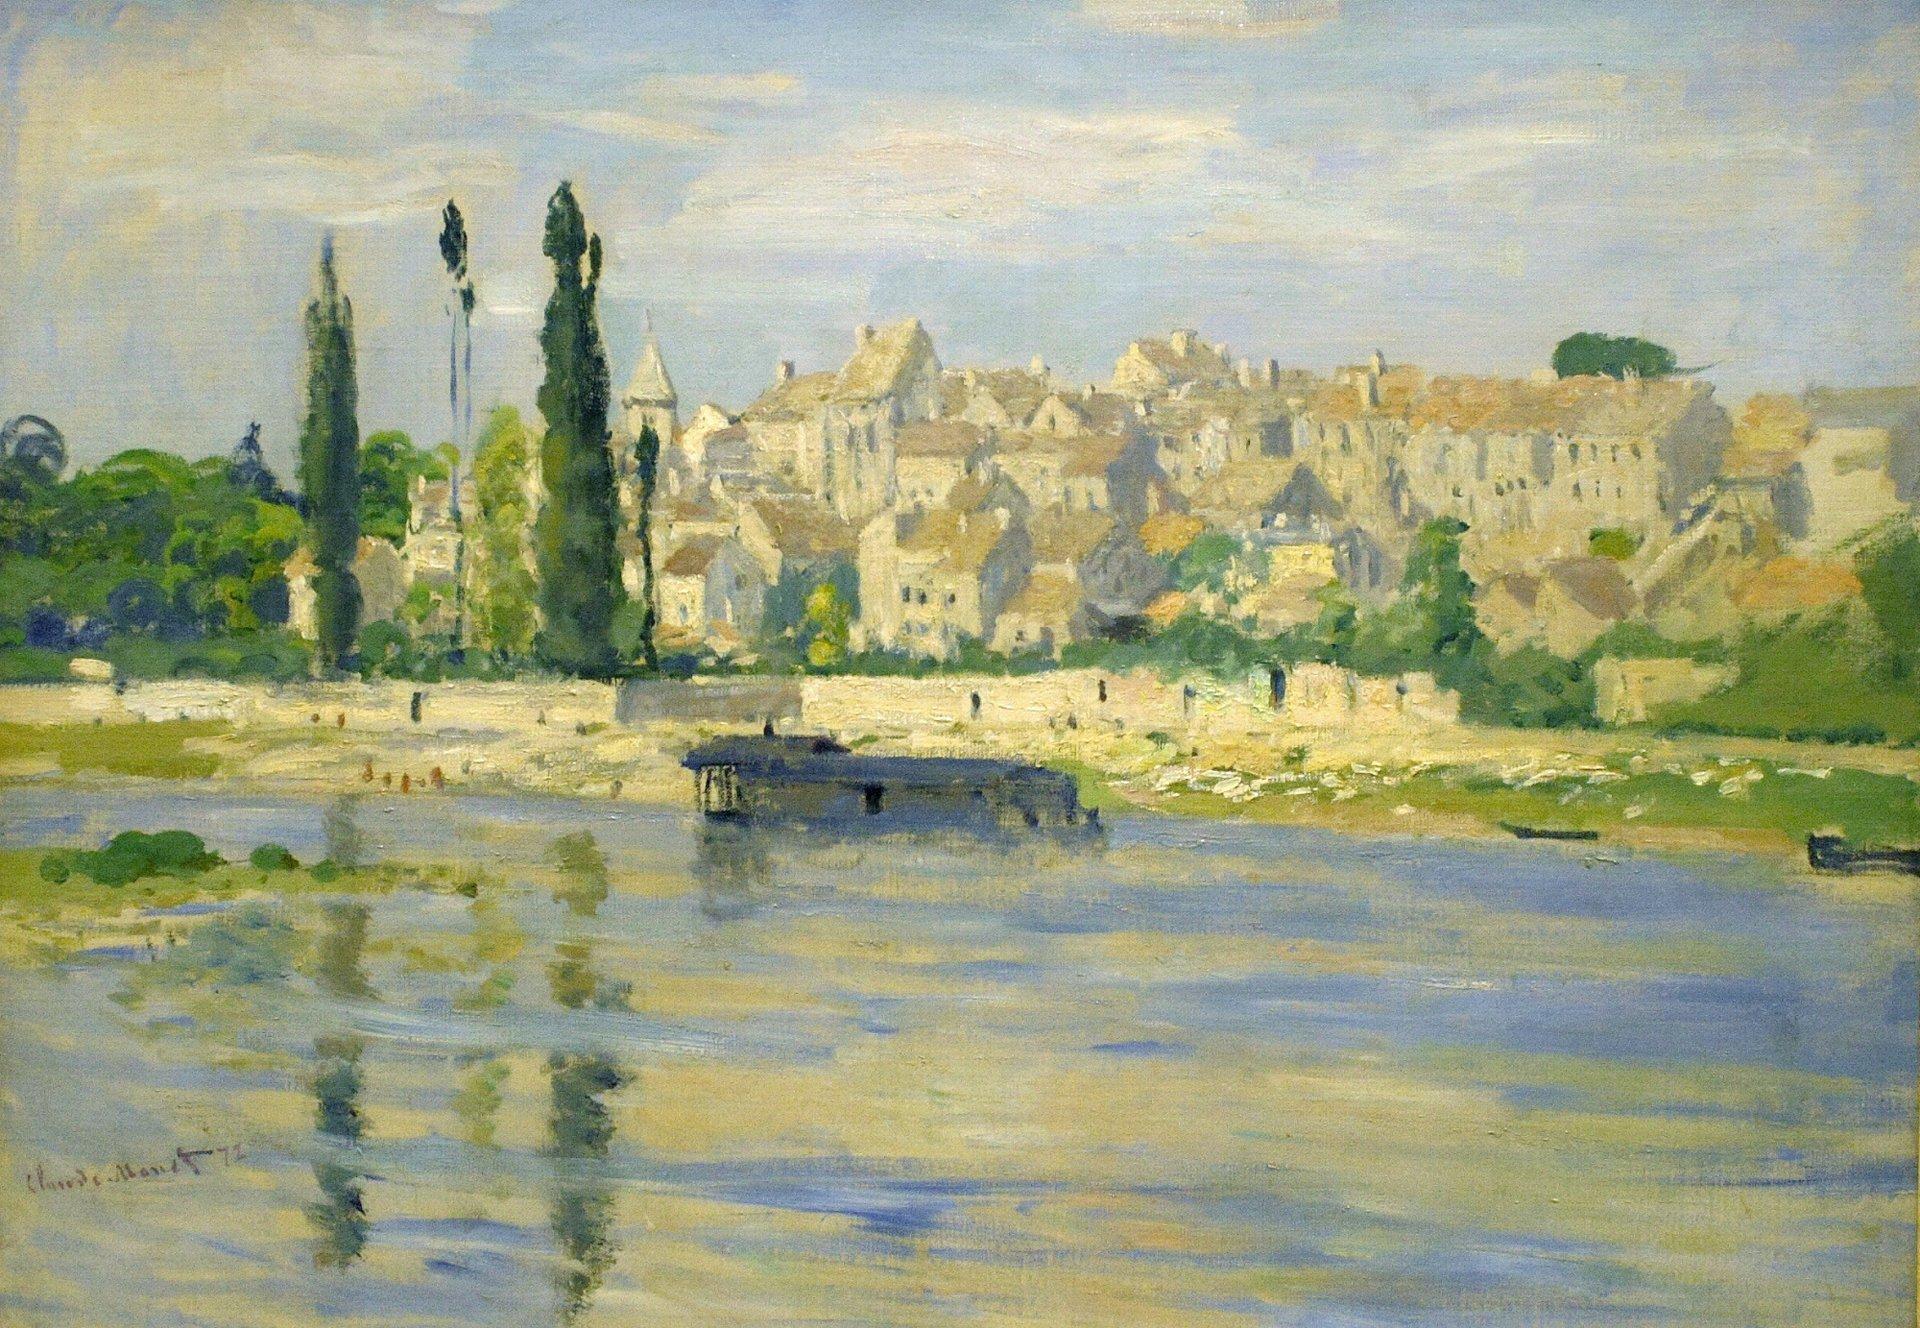 Обои Клод Моне, Пейзаж, картина. Разное foto 11